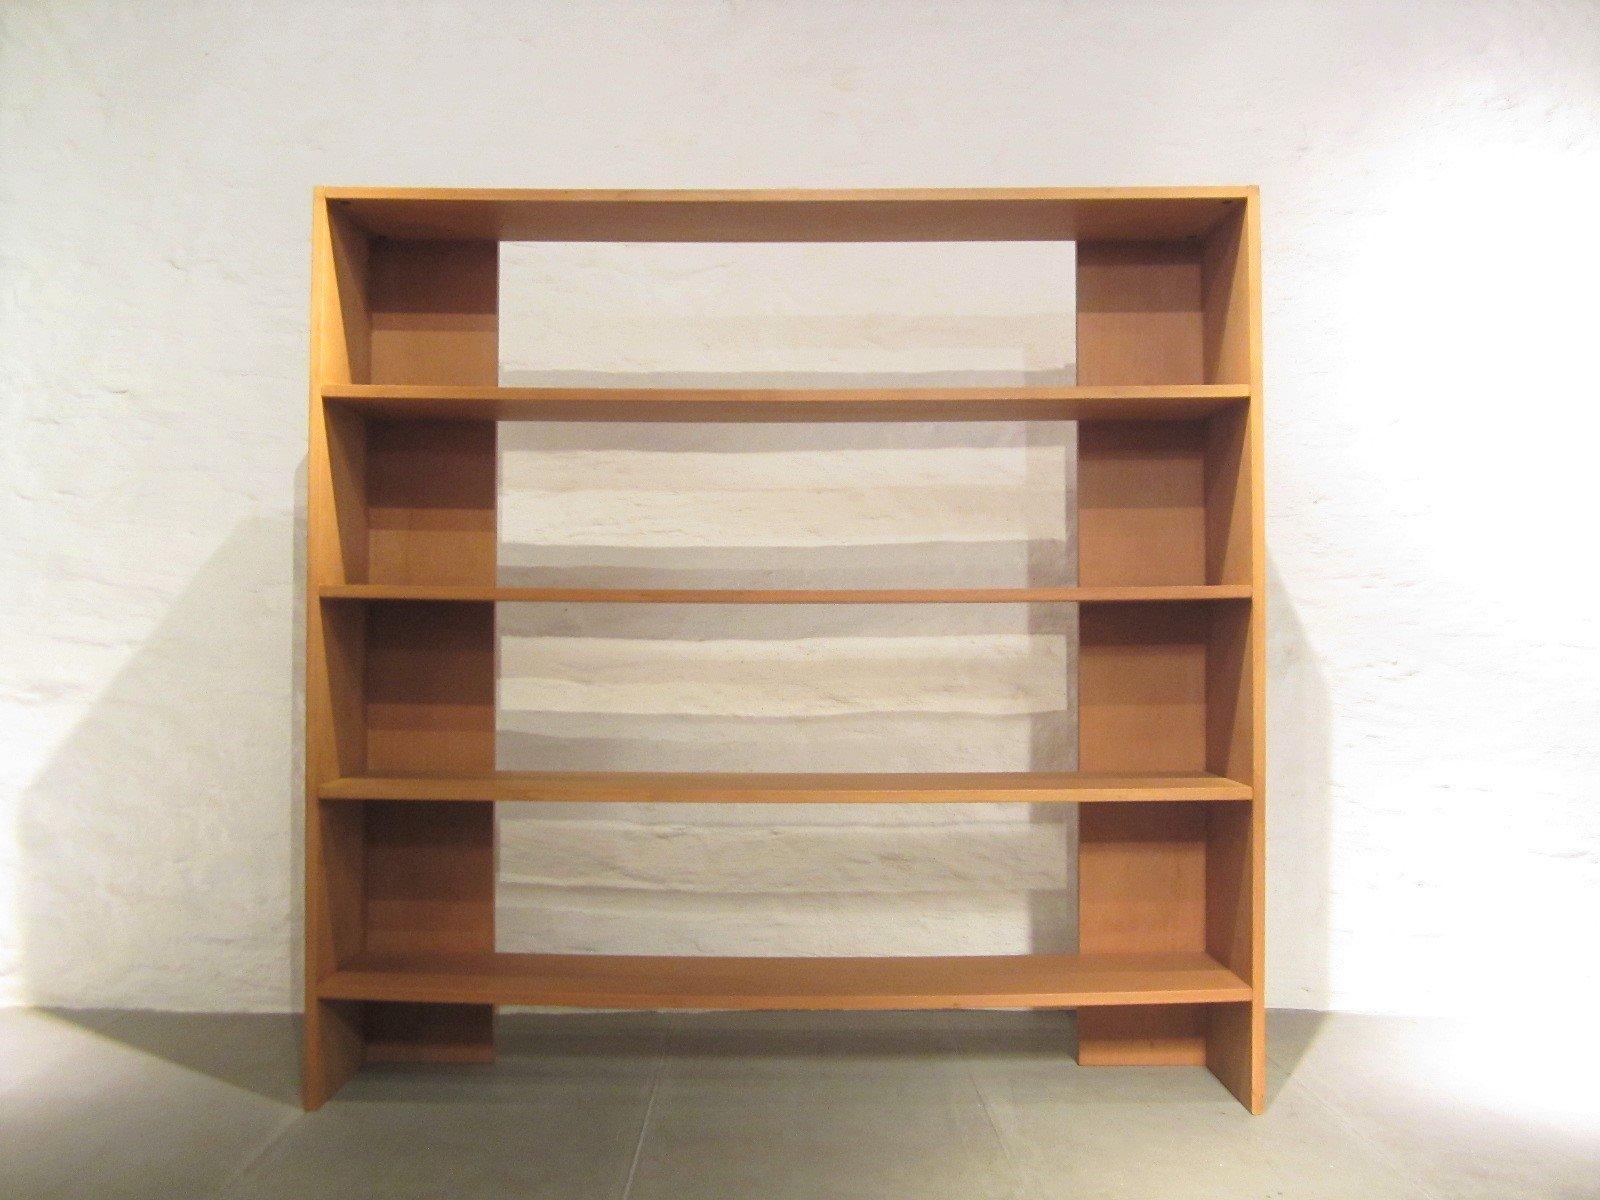 Gerrit rietveld furniture - Vintage Italian Crate Bookshelf By Gerrit Rietveld For Cassina